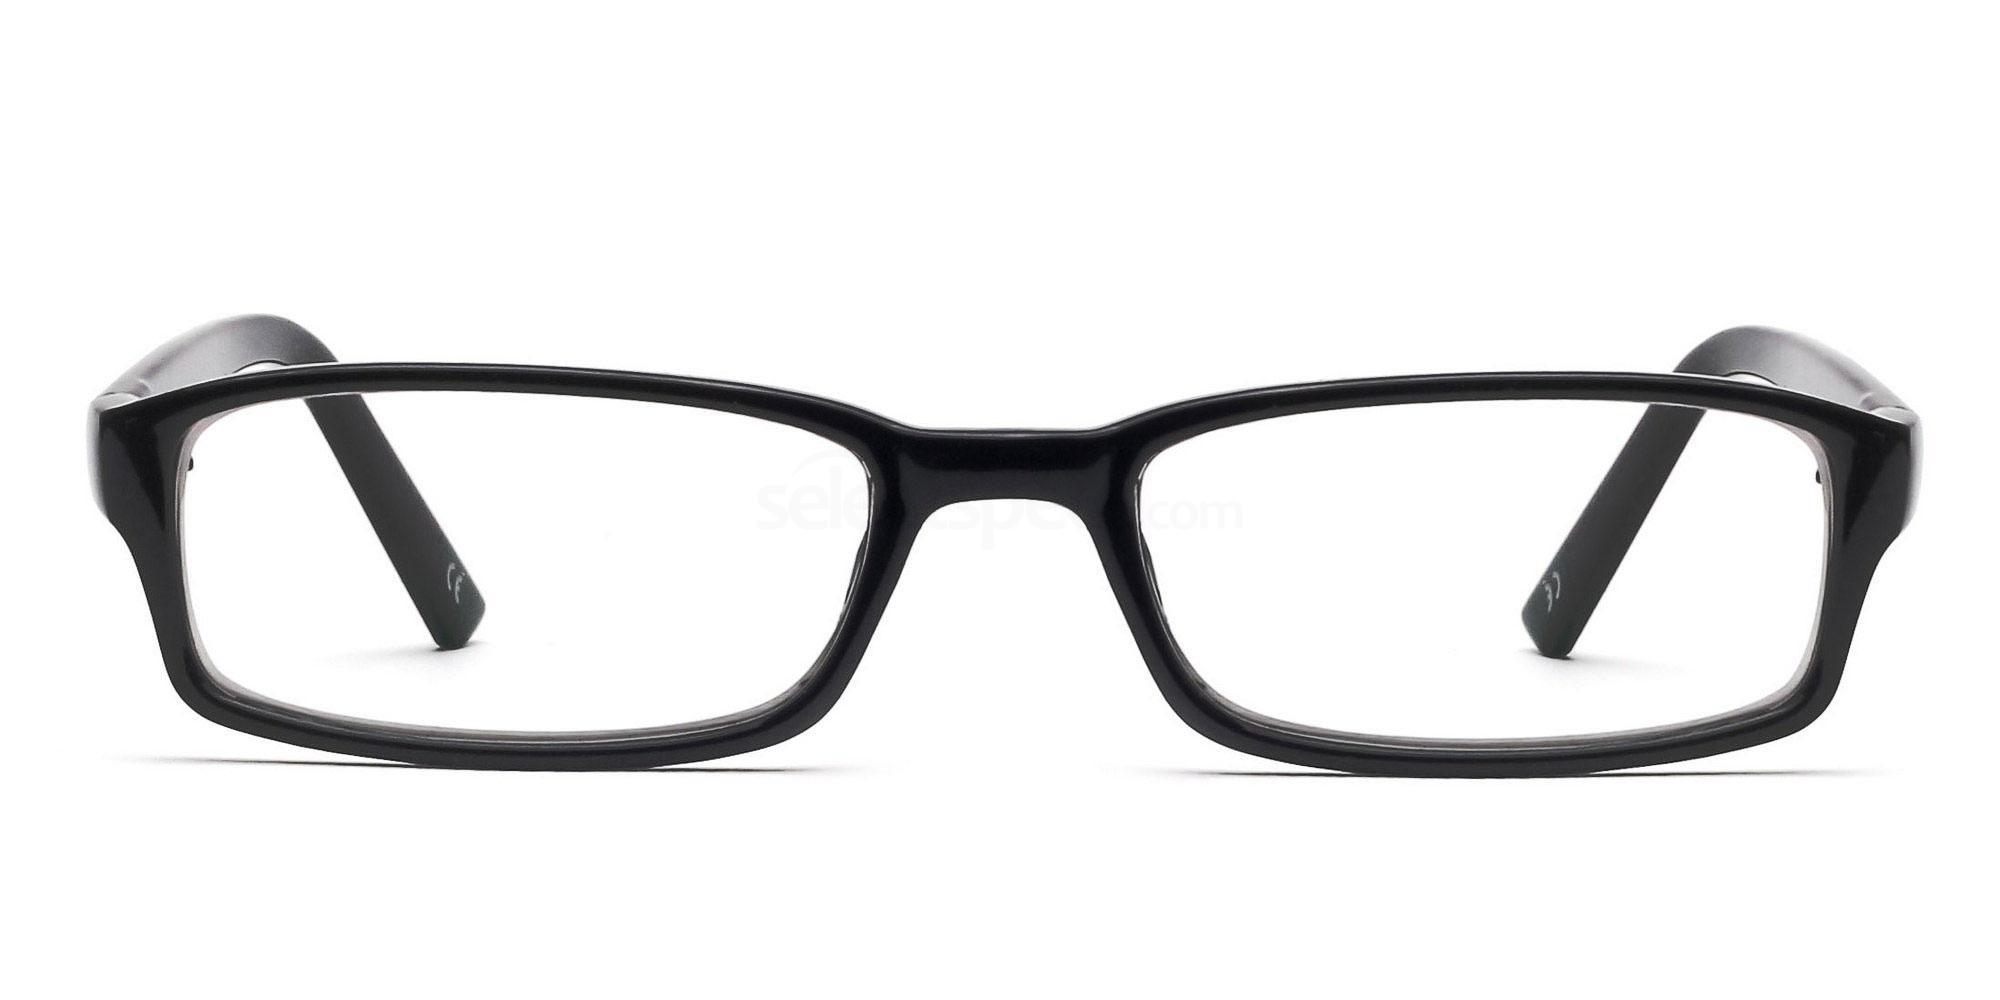 COL.01 2264 - Black Glasses, Savannah